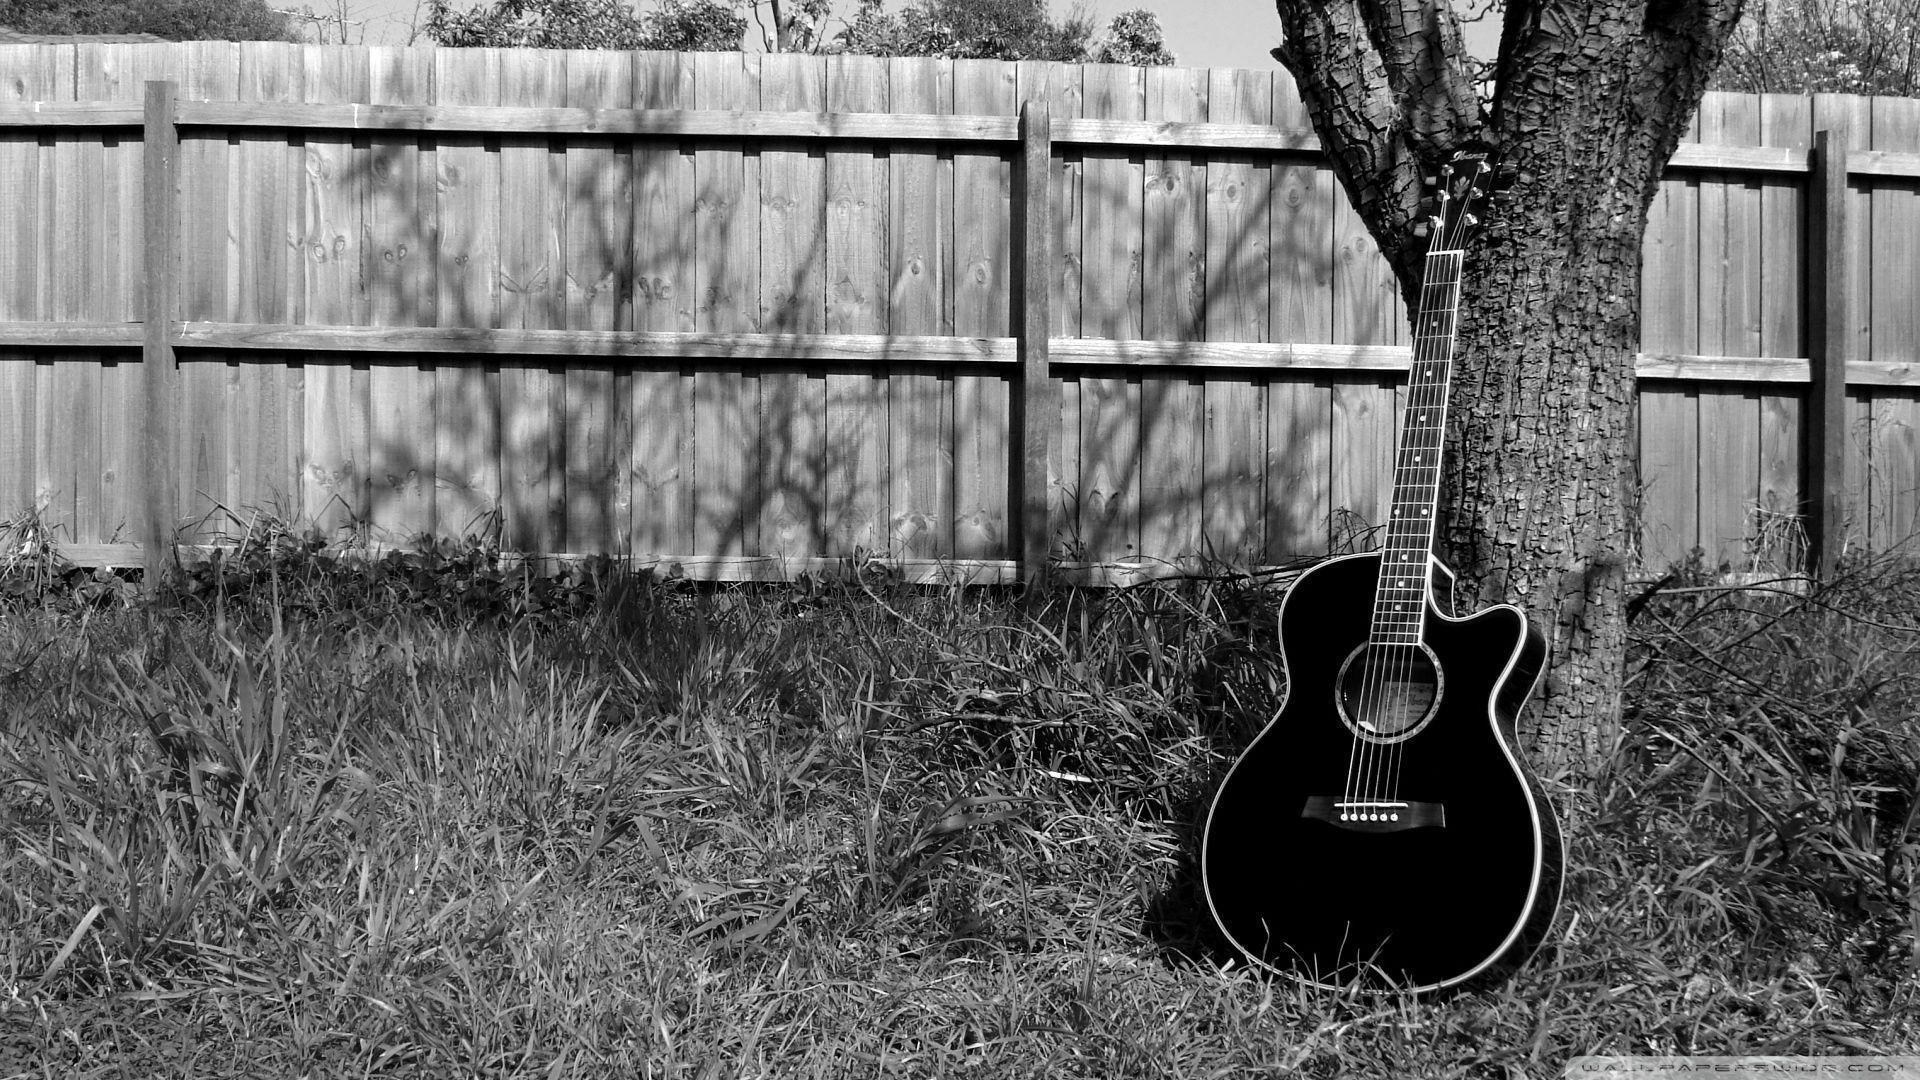 Acoustic Guitar Wallpaper For Facebook Cover With Quotes Acoustic Guitar Wallpapers Wallpaper Cave